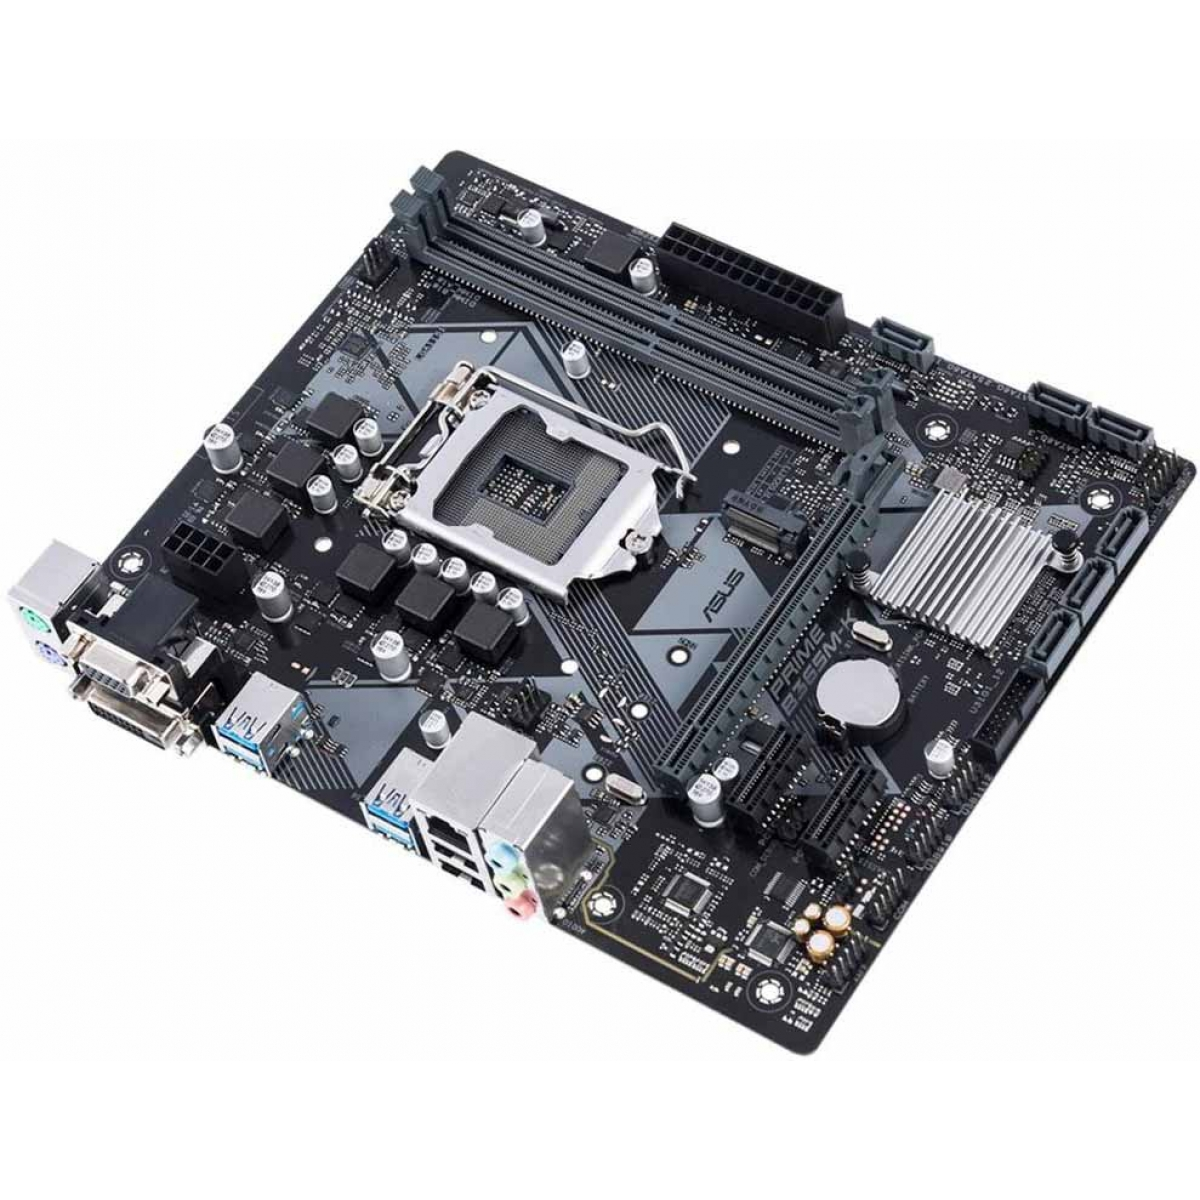 Placa Mãe Asus Prime B365M-K, Chipset B365, Intel LGA 1151, mATX, DDR4